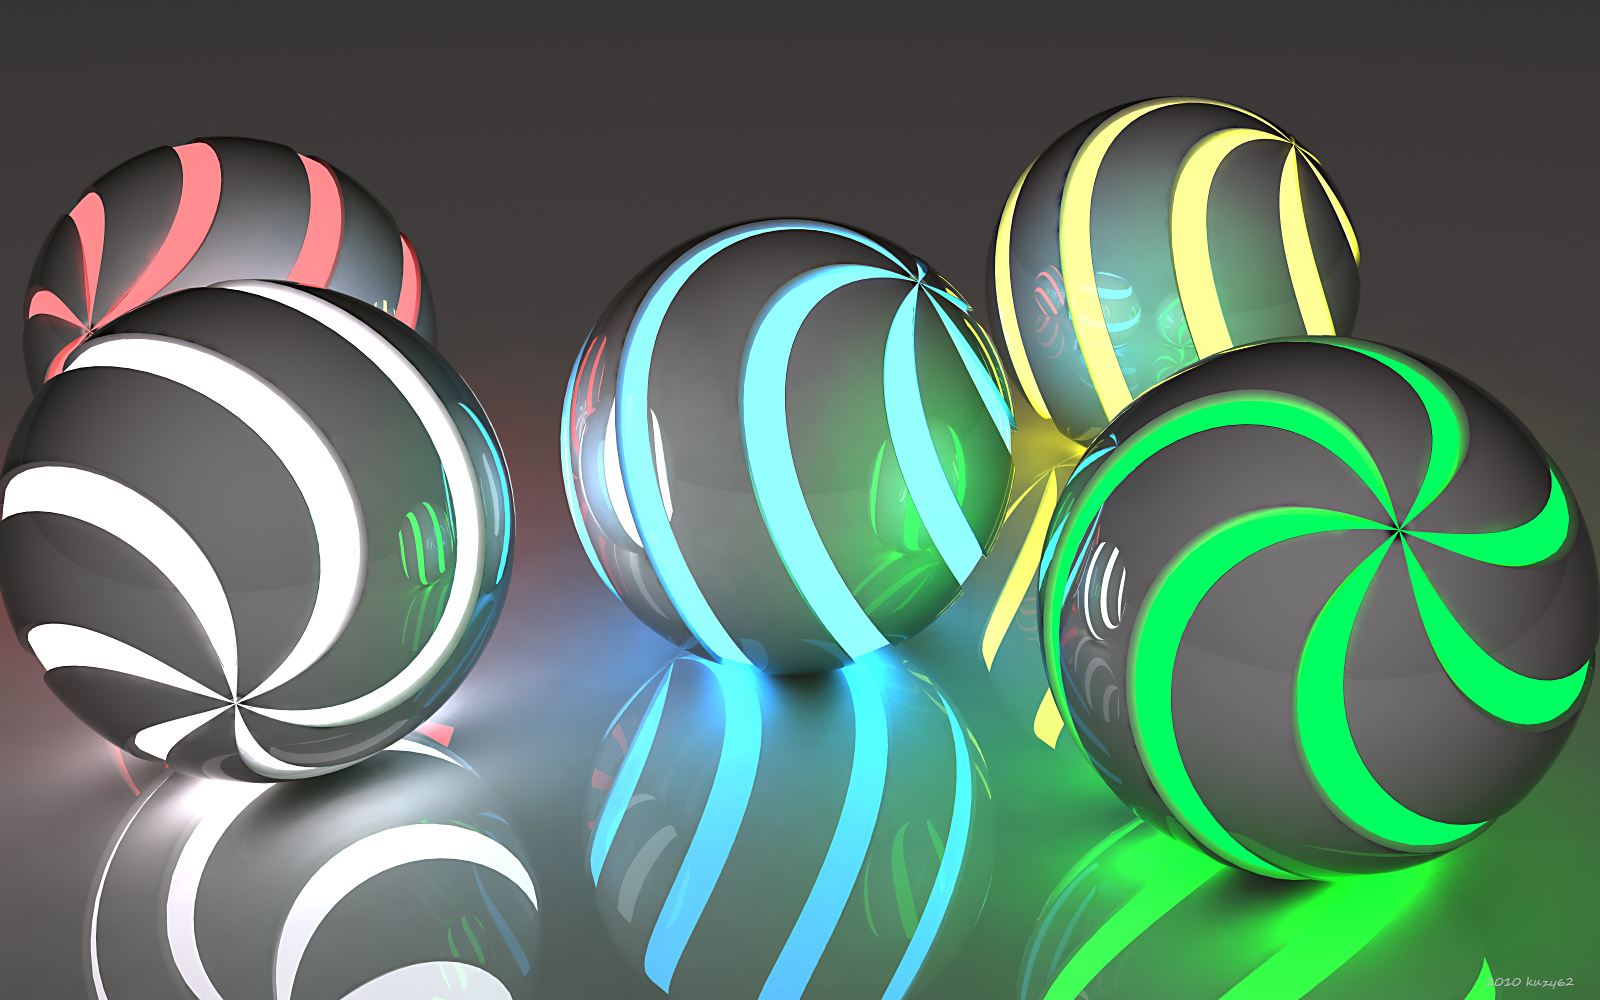 Spiral Orbs by kuzy62